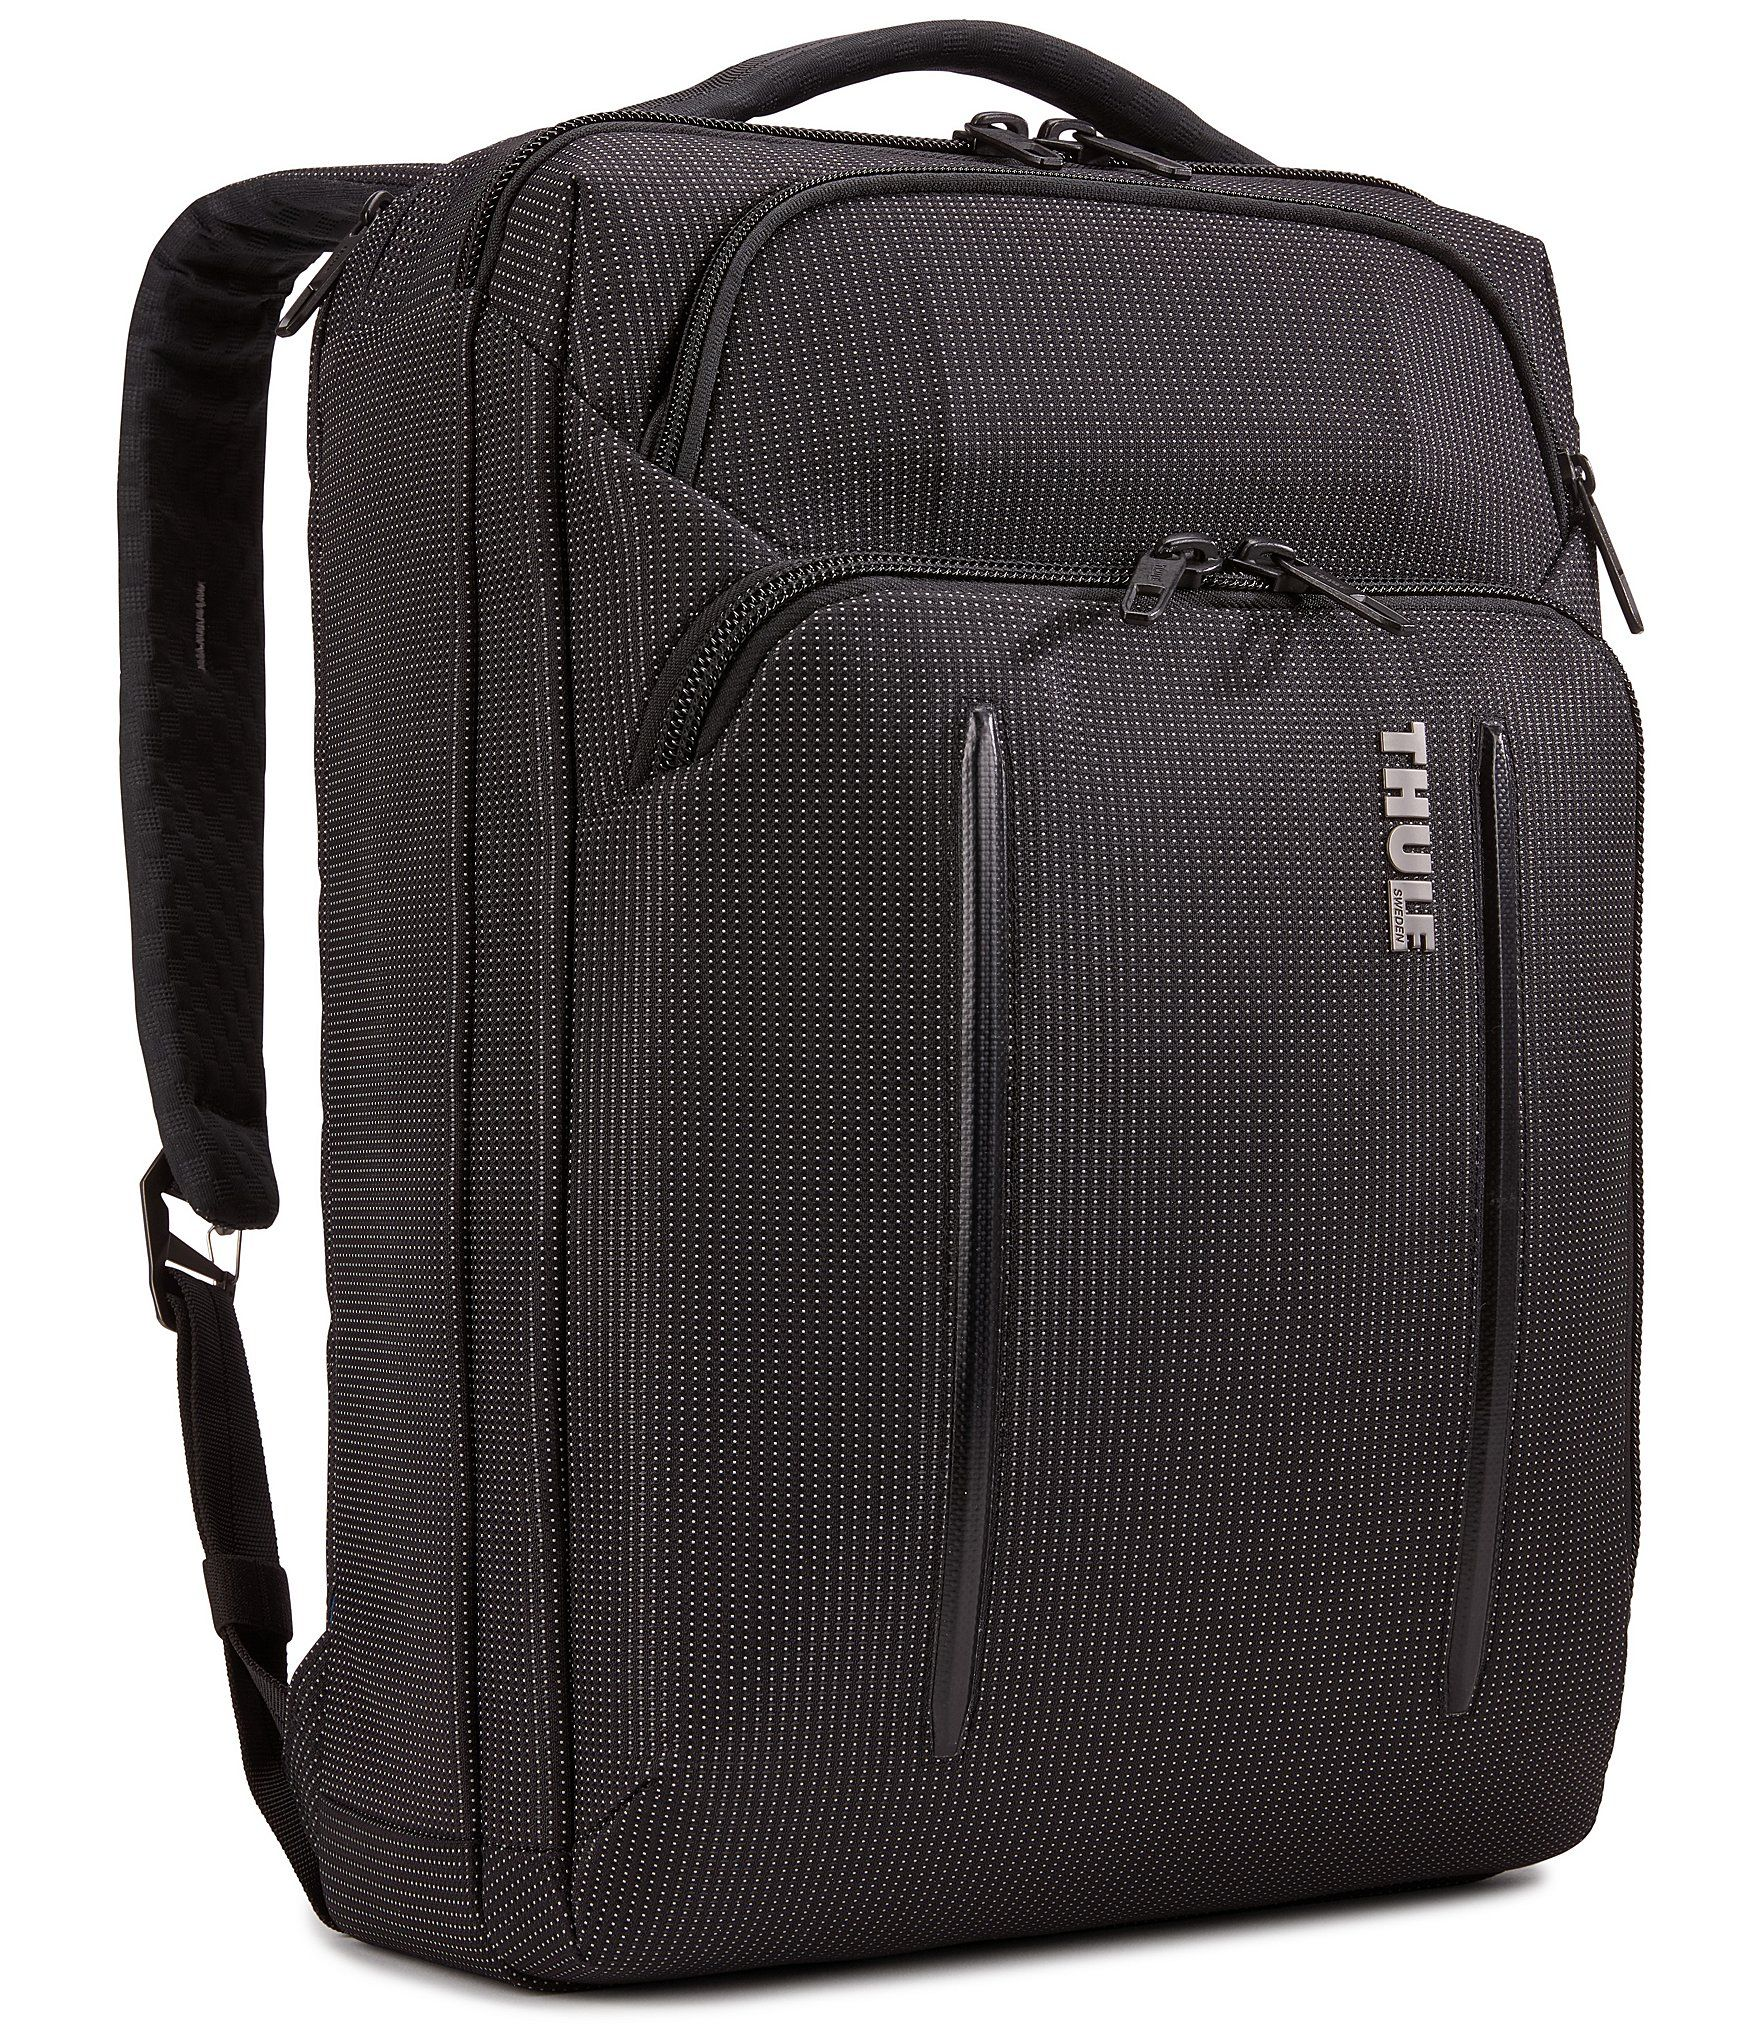 Thule Crossover 2 Convertible Laptop Bag 15 6 Black N A In 2020 Laptop Bag Laptops For Sale Laptop Backpack